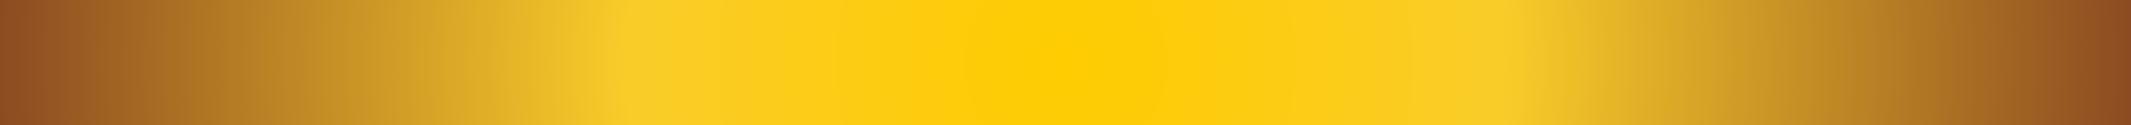 grad-yellow